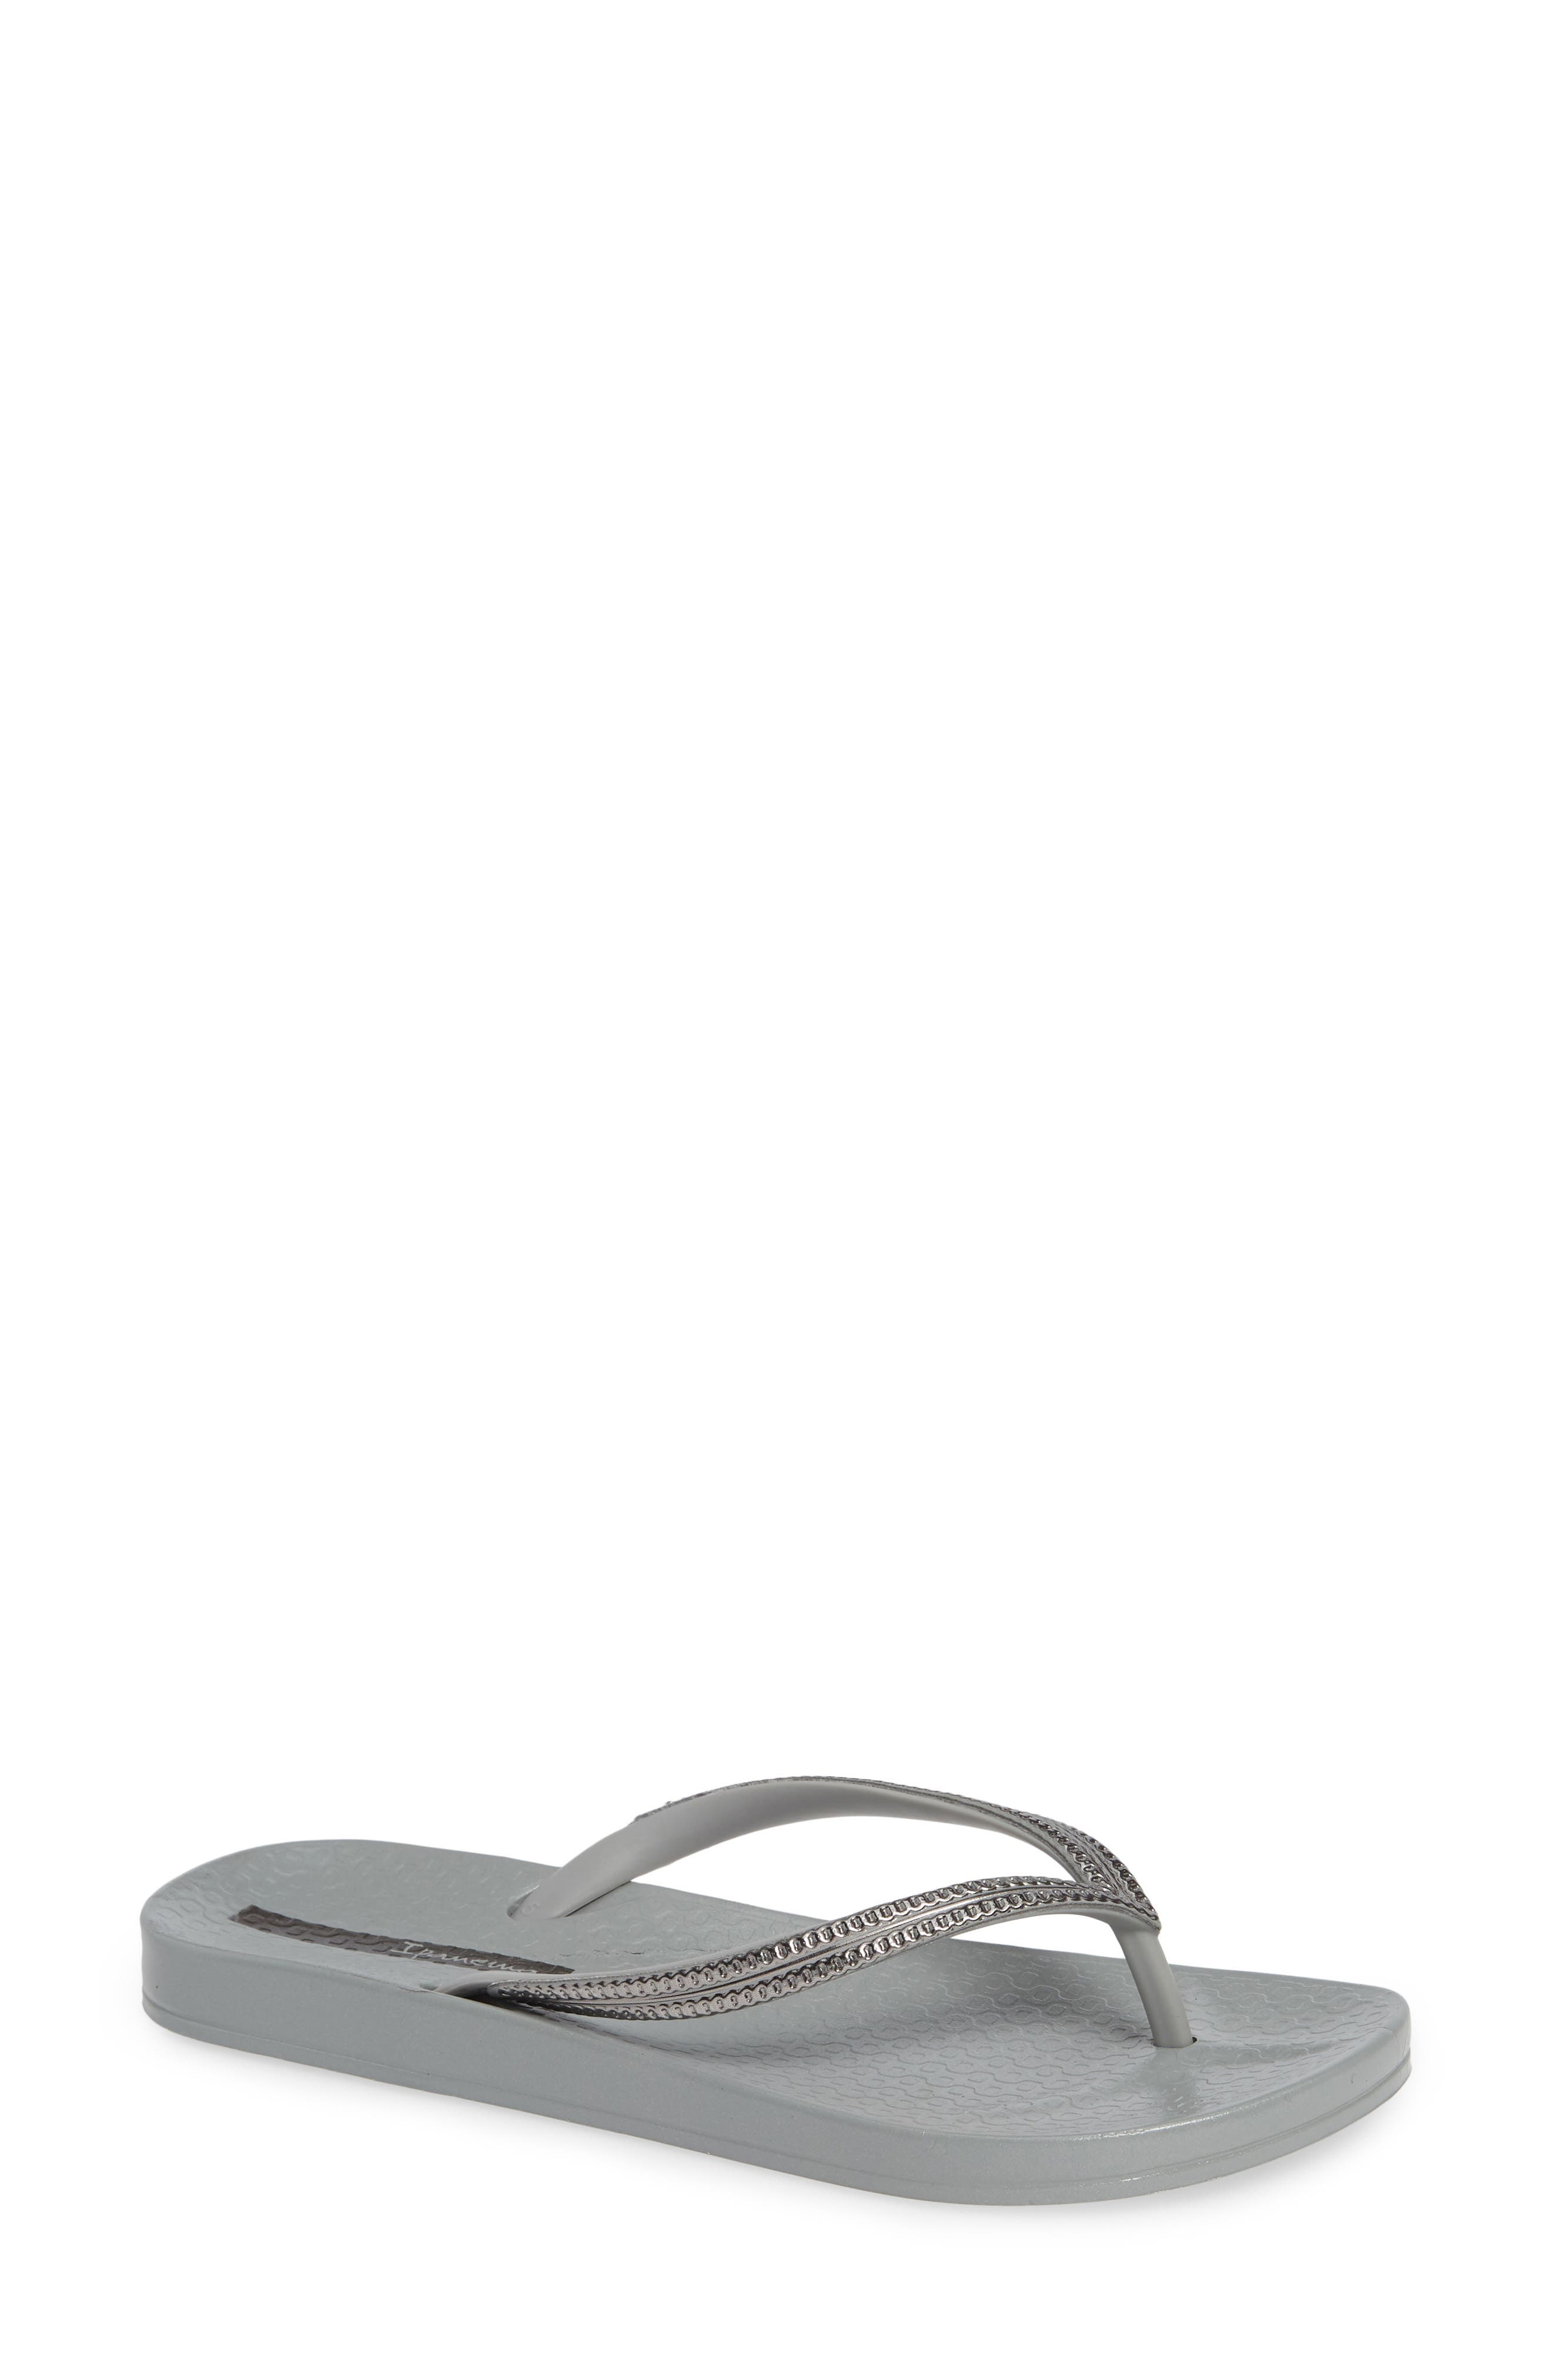 IPANEMA Ana Metallic Flip Flop in Grey/ Grey